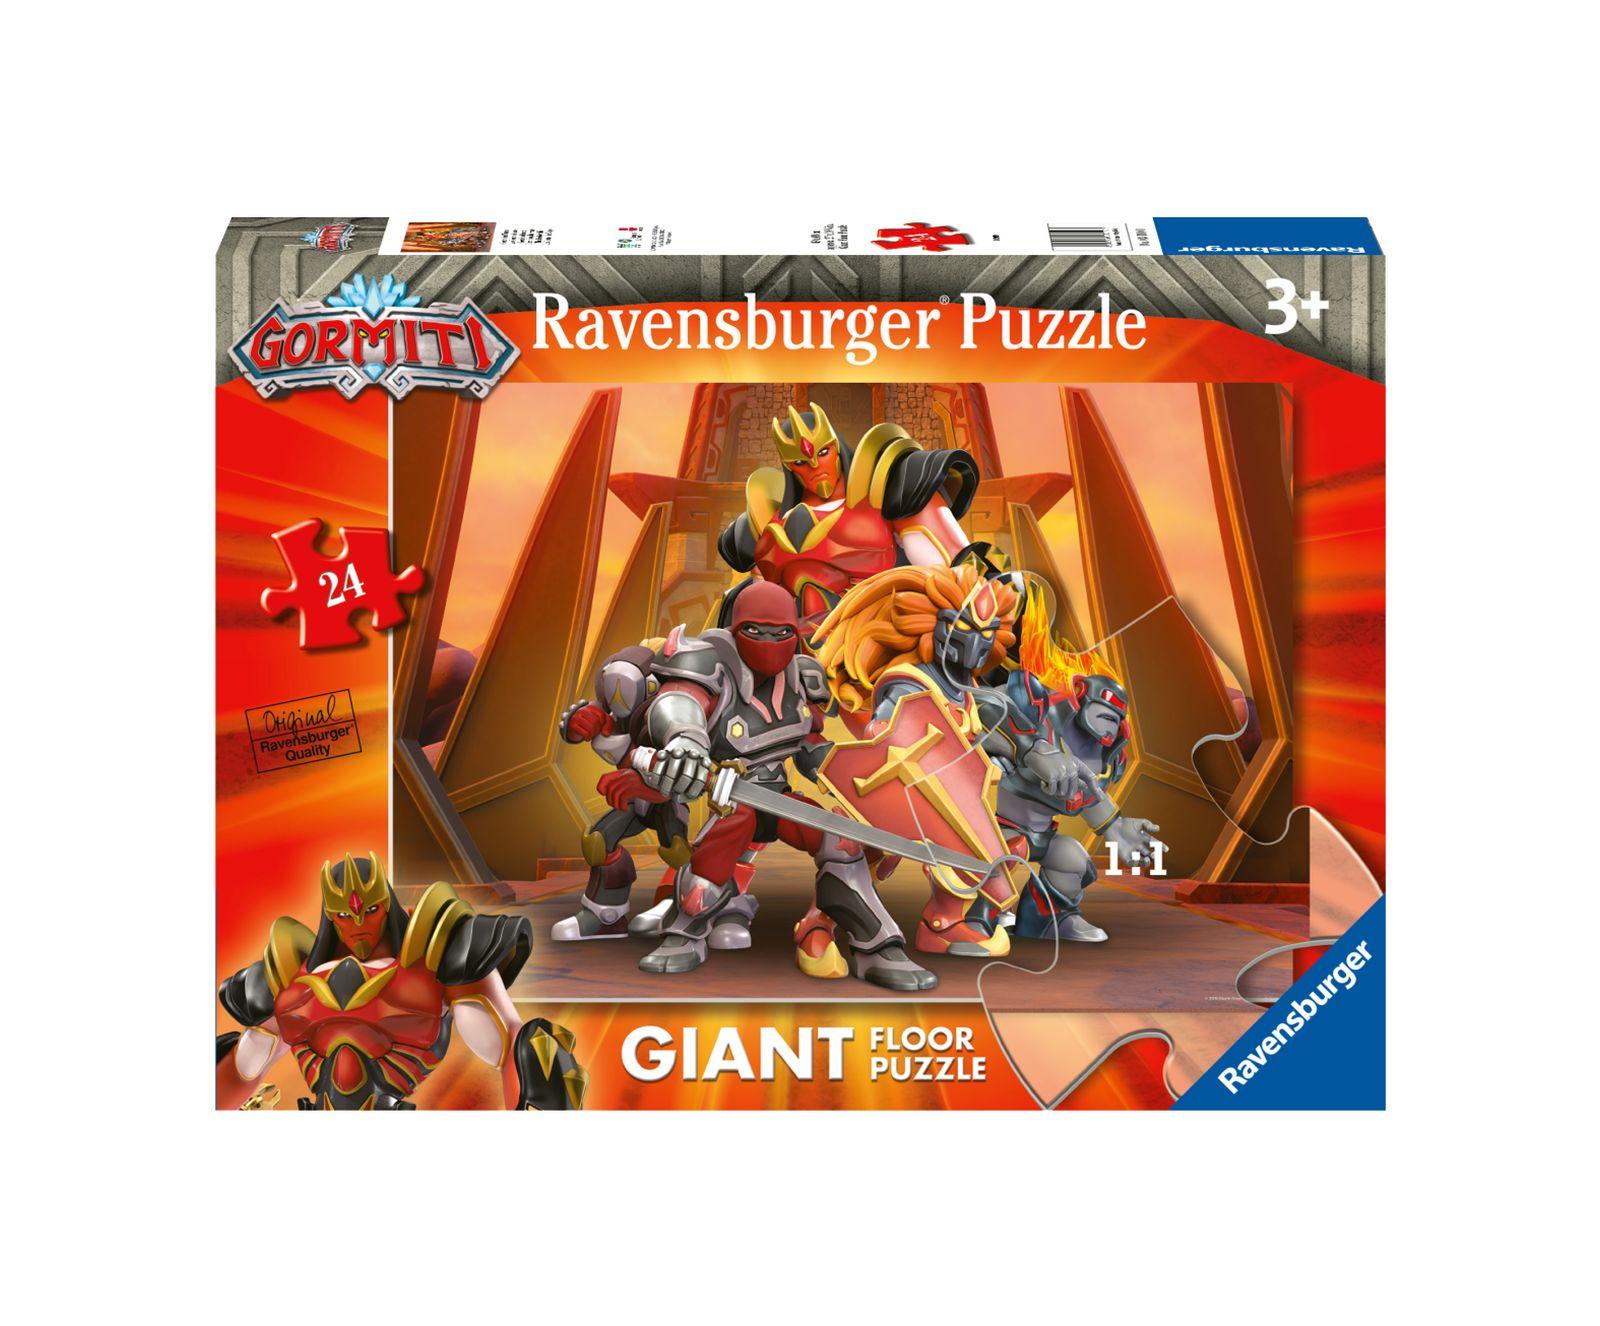 Ravensburger puzzle 24 pezzi giant gormiti - Ravensburger1